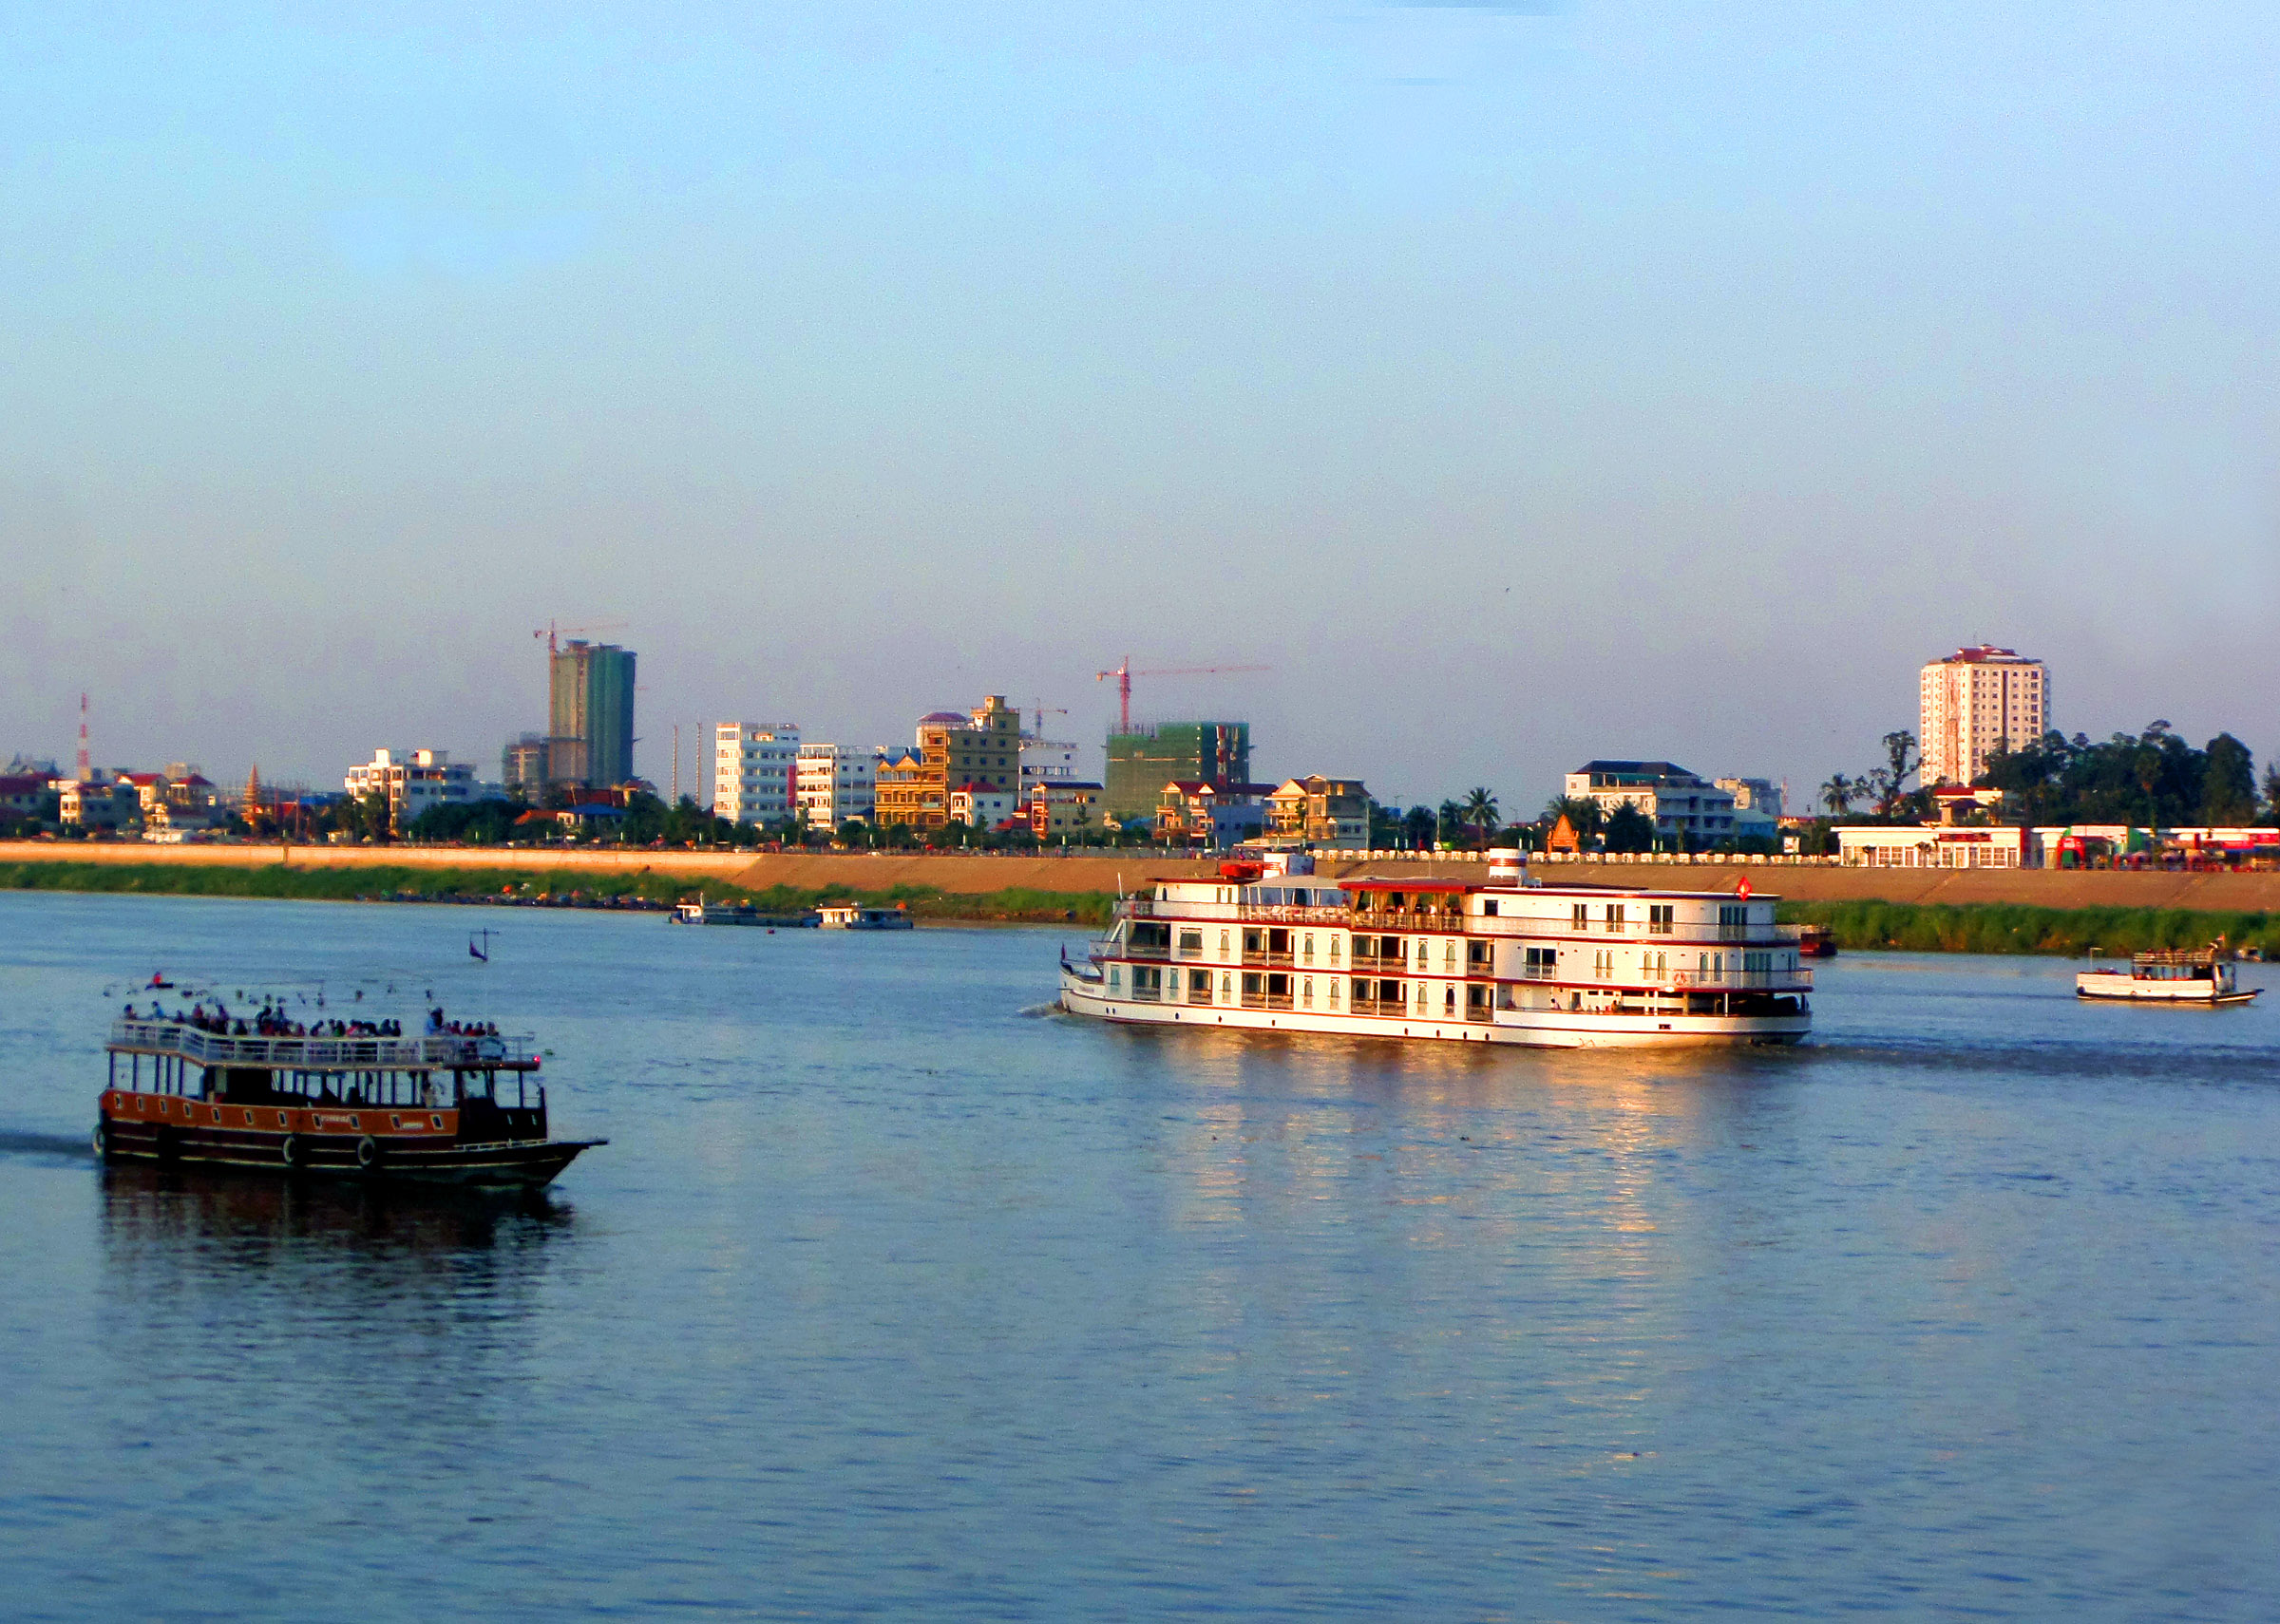 Tonle Sap - Mekong River, Boats, Cambodia, Cruise, Mekong, HQ Photo